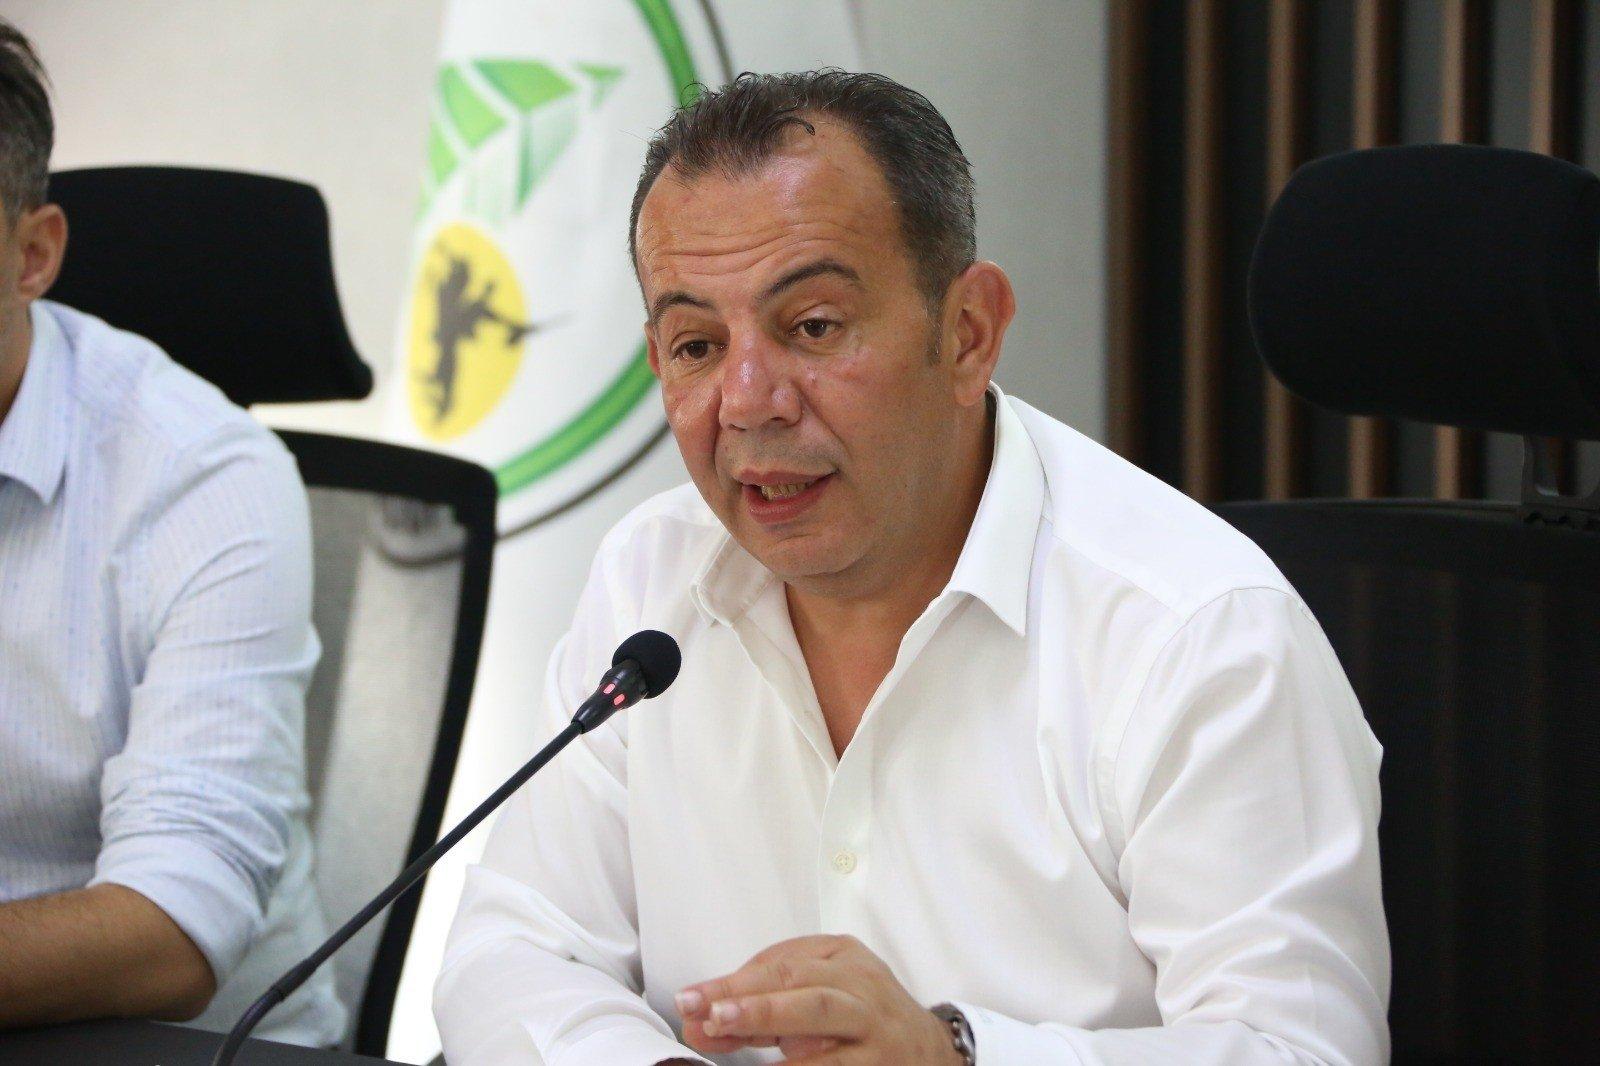 Bolu Mayor Tanju Özcan speaks at a press conference, Bolu, northern Turkey, July 26, 2021. (İHA Photo)